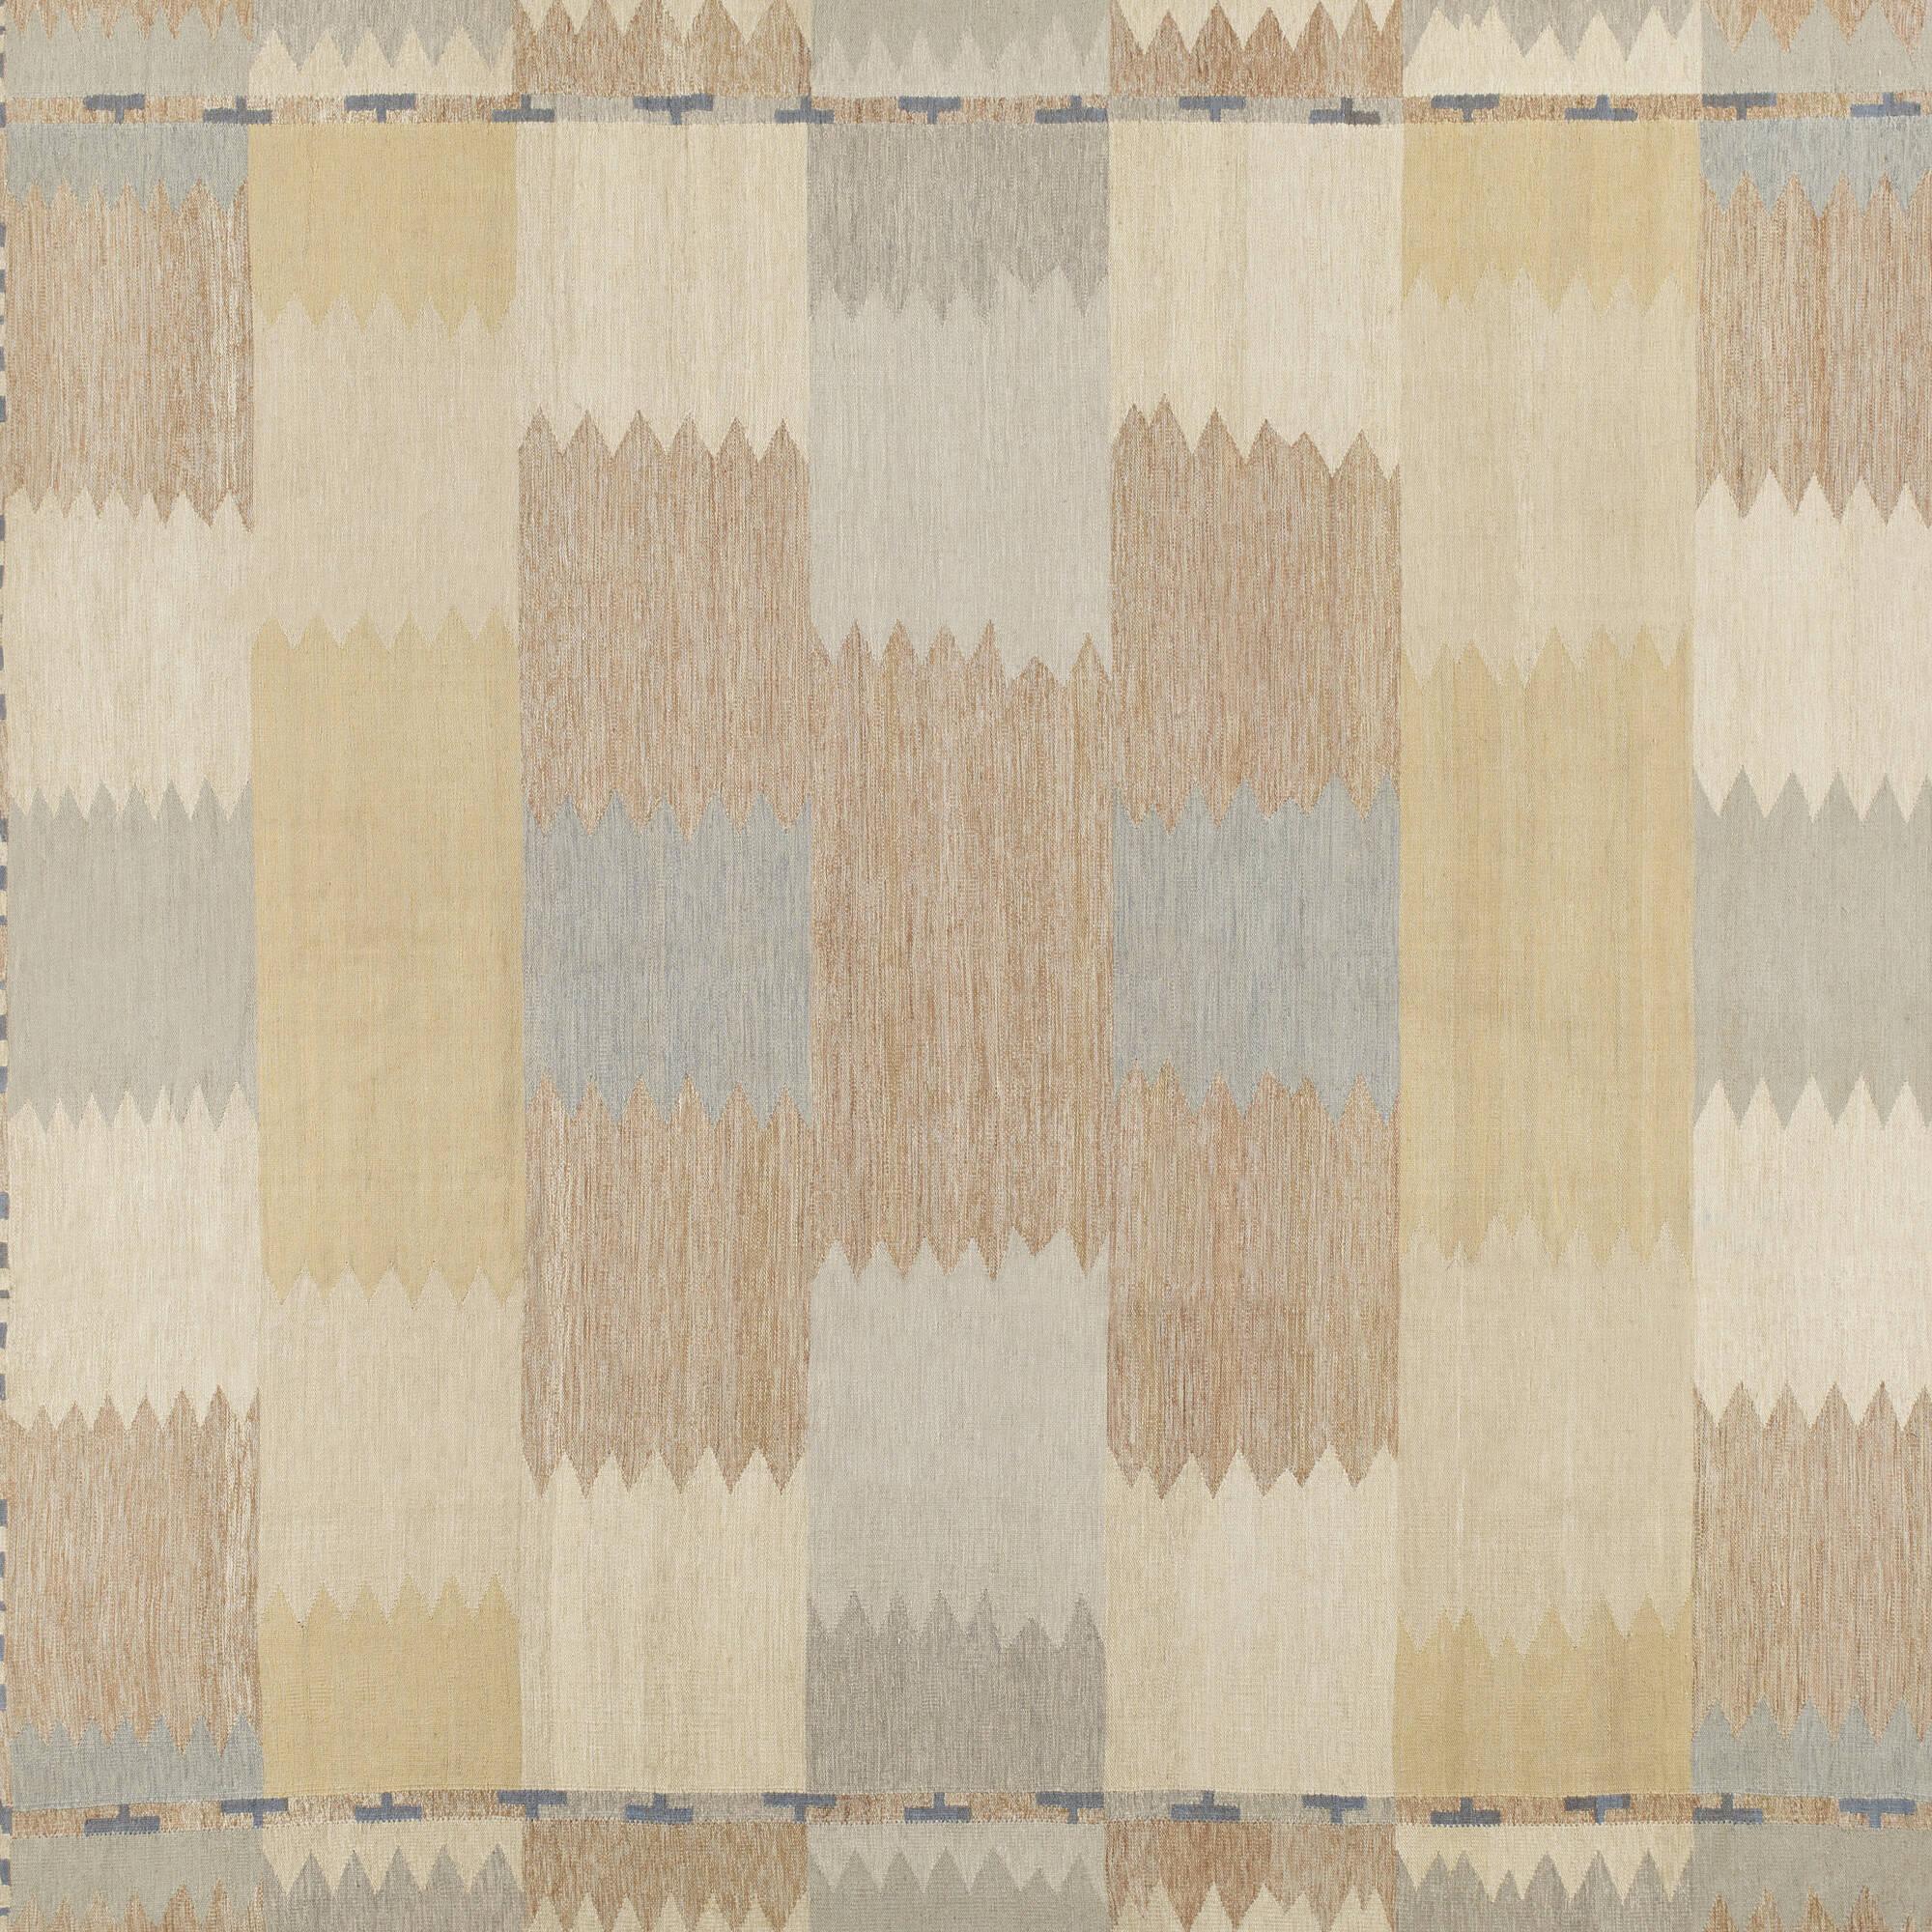 264: Swedish / contemporary flatweave carpet (2 of 2)